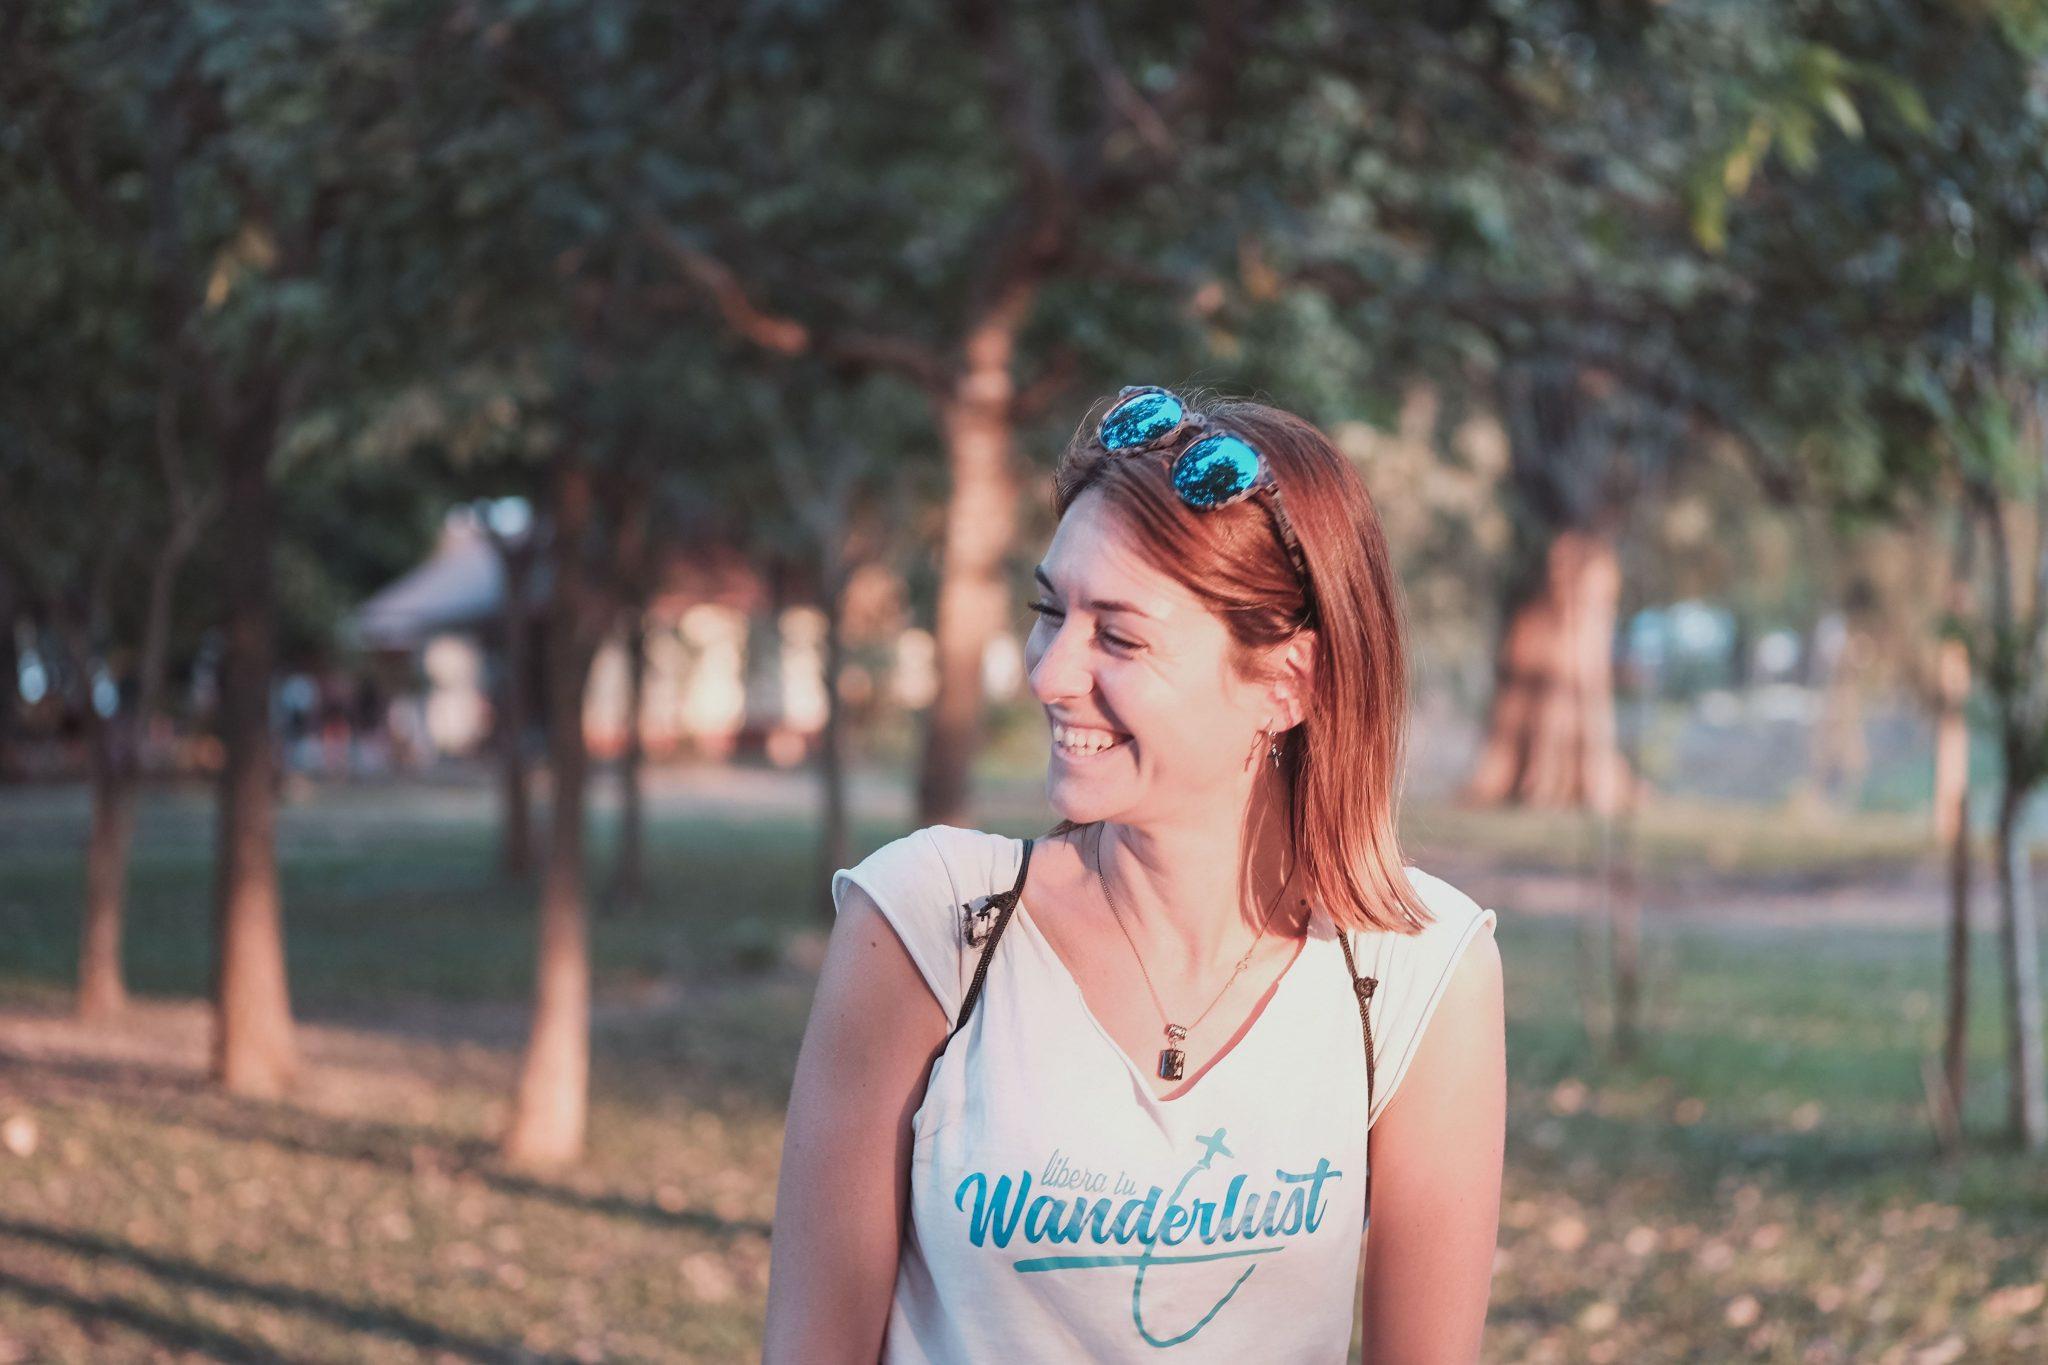 "<a class=""titulo"" href=""https://www.liberatuwanderlust.com/"">Susana, Libera tu Wanderlust</a>"